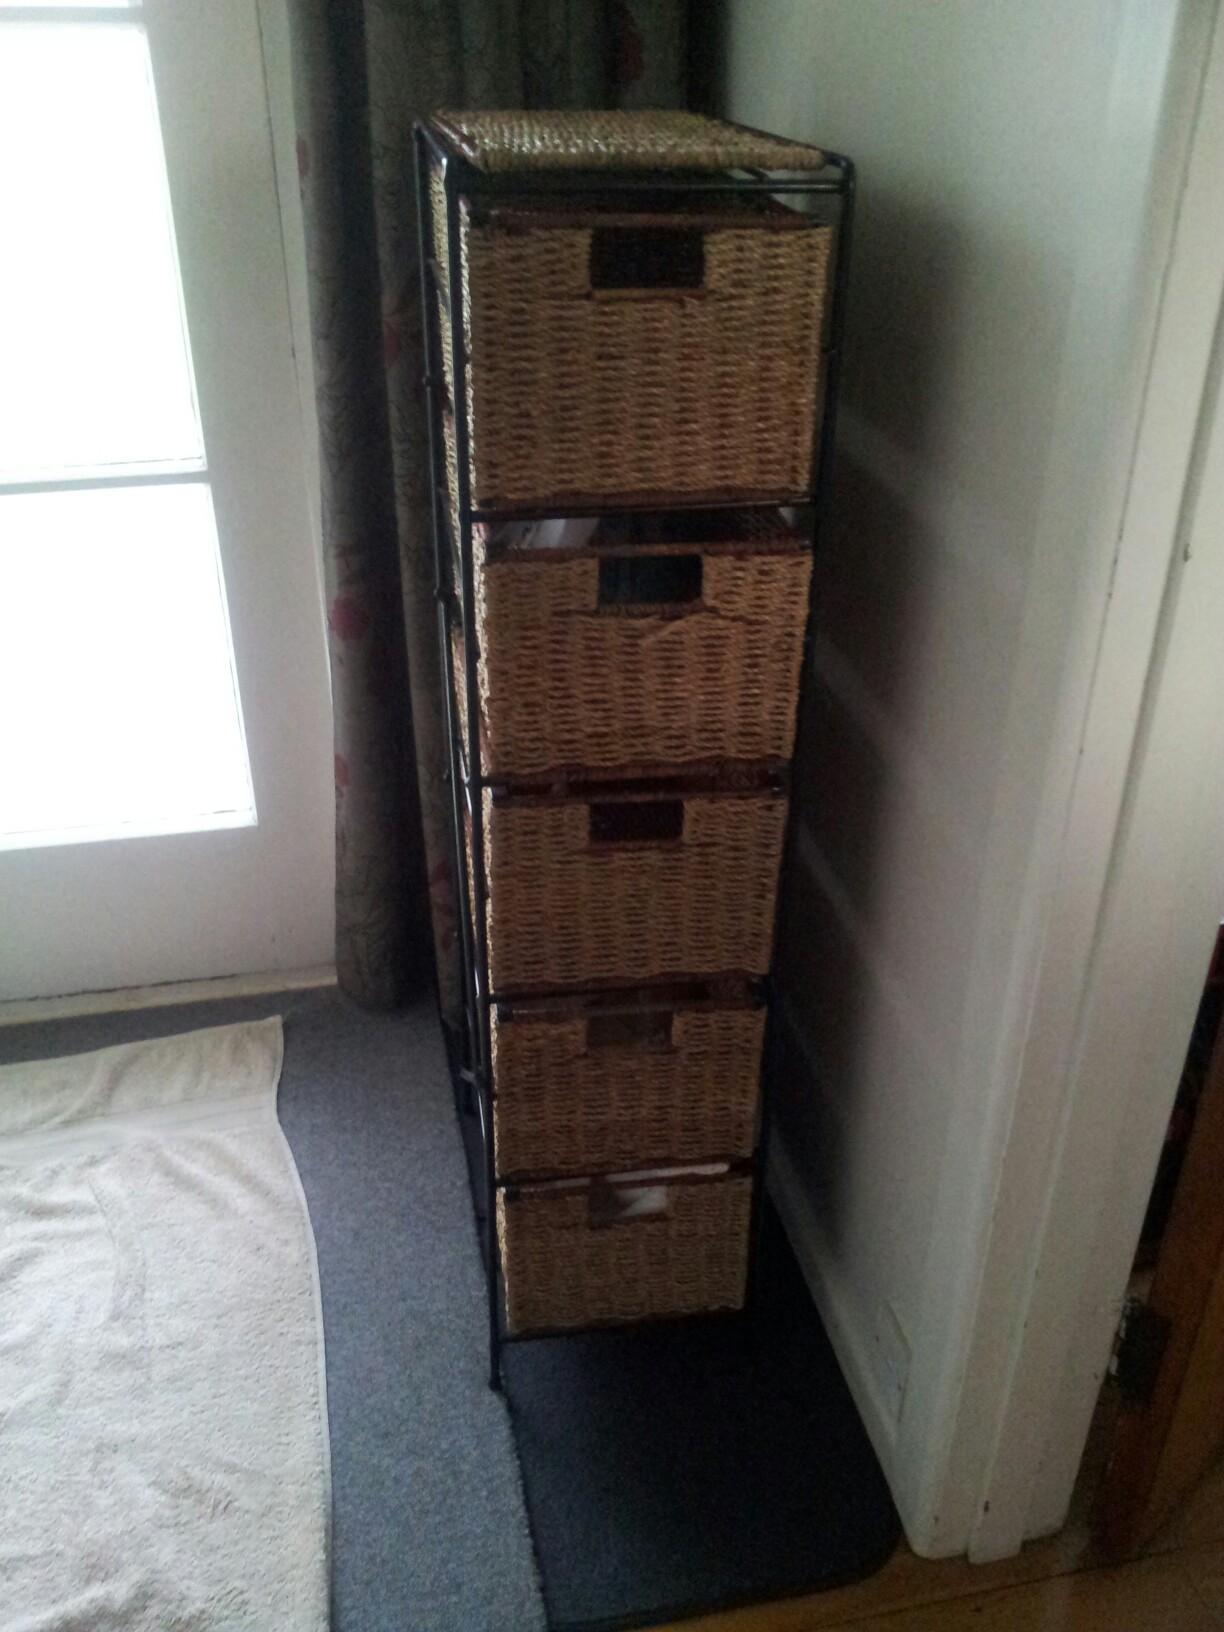 Cane tall drawer shelf